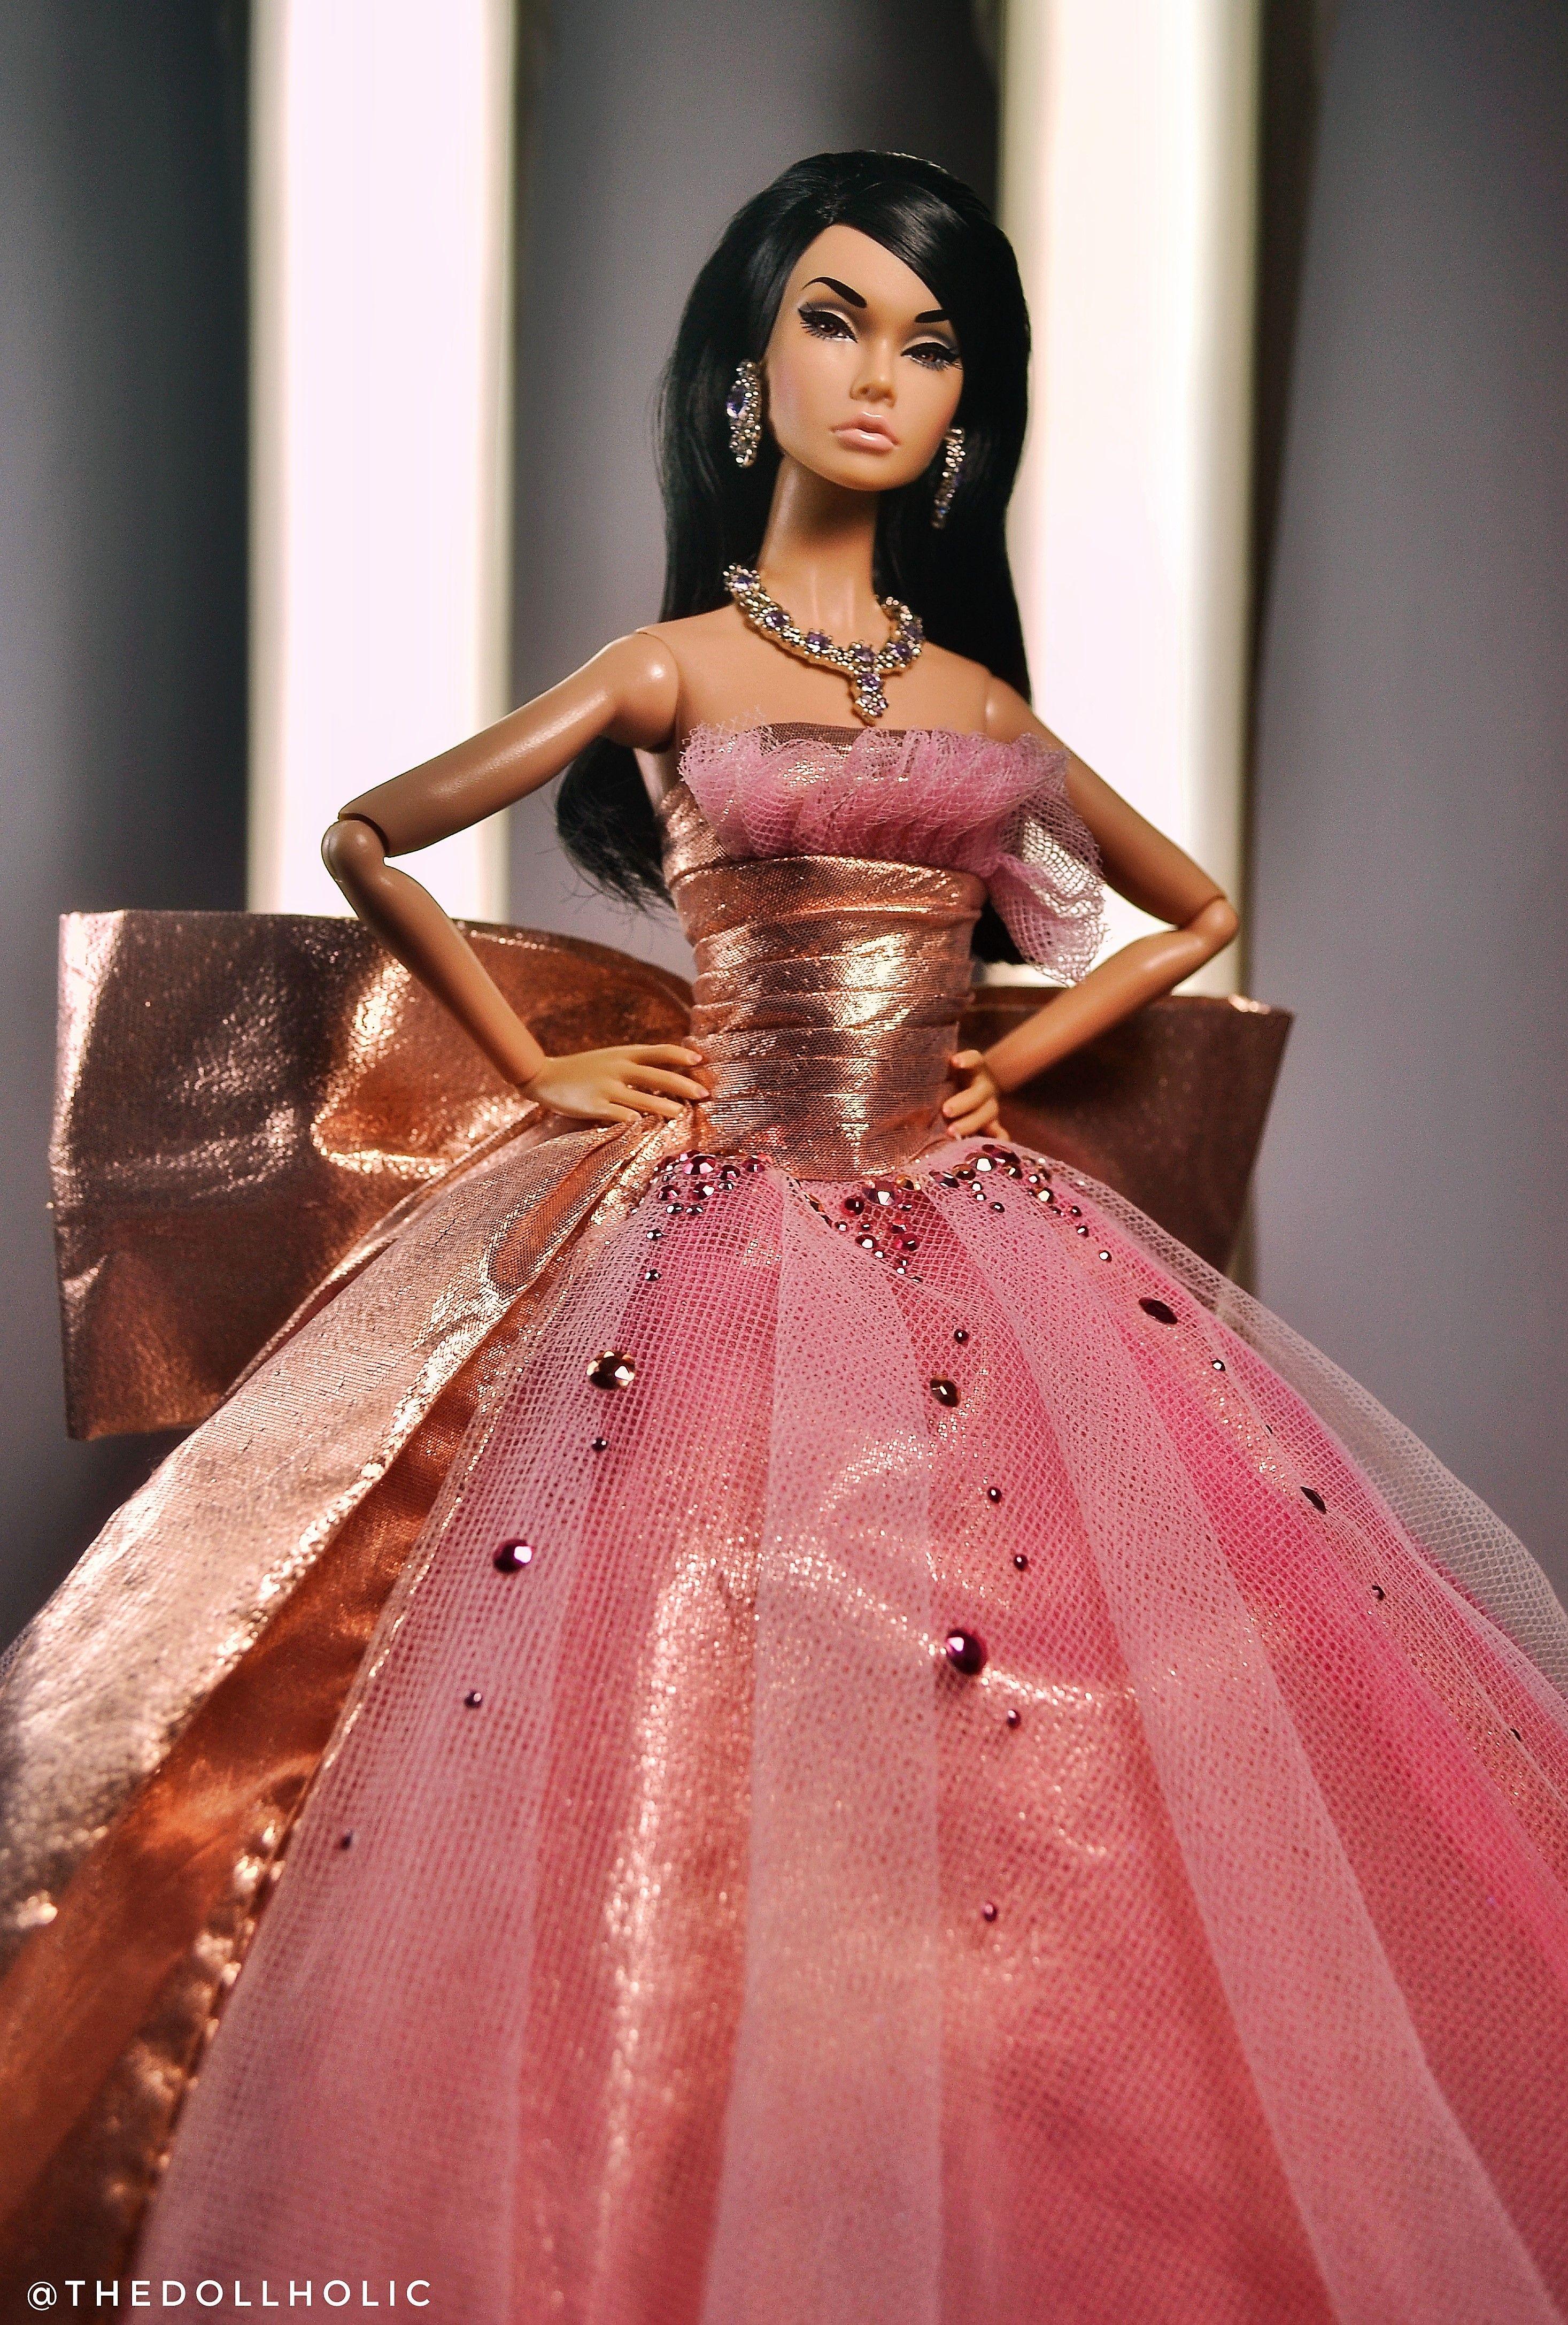 Pin de Cheryl M en BARBIE | Pinterest | Barbie y Muñecas